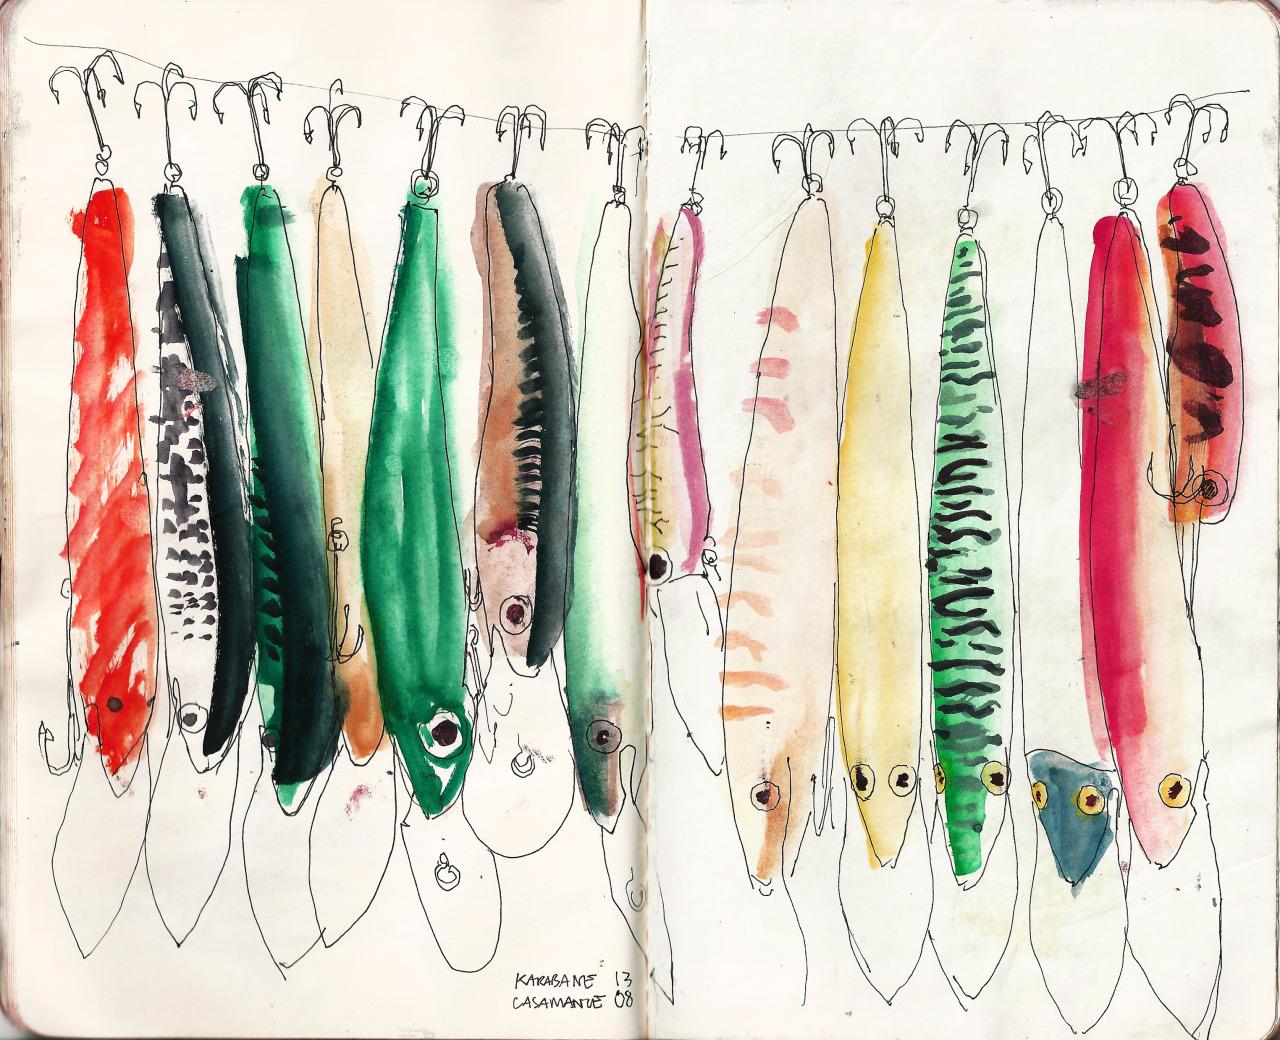 noteathing.tumblr.com Fishing Lure. Karabane. Senegal 2013